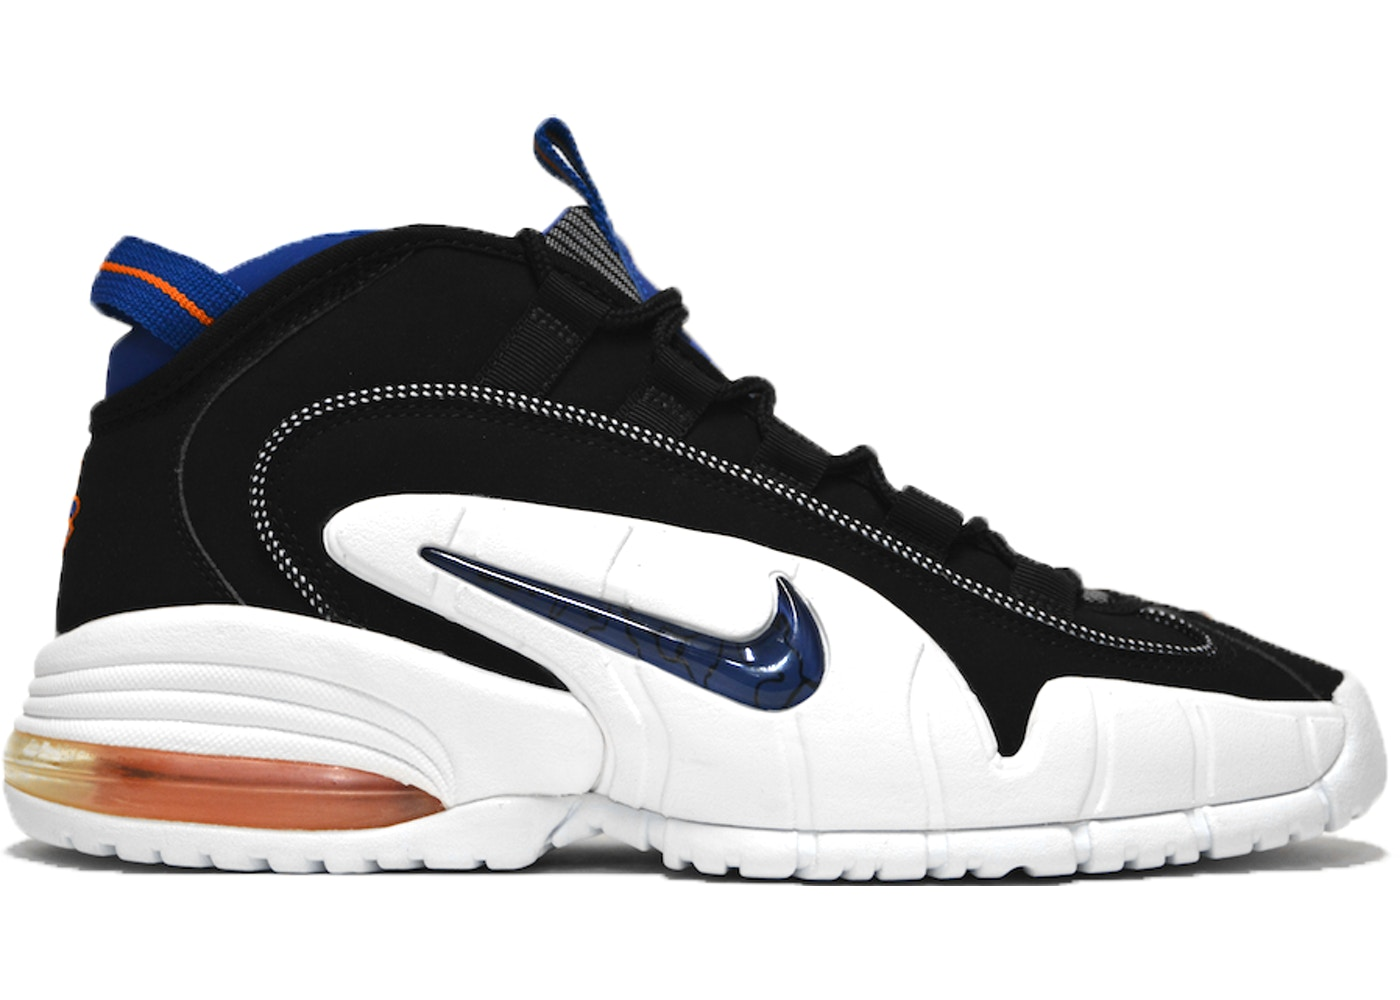 sports shoes c2d5c 348b3 Air Max Penny 1 Knicks (2005) - 624017-041